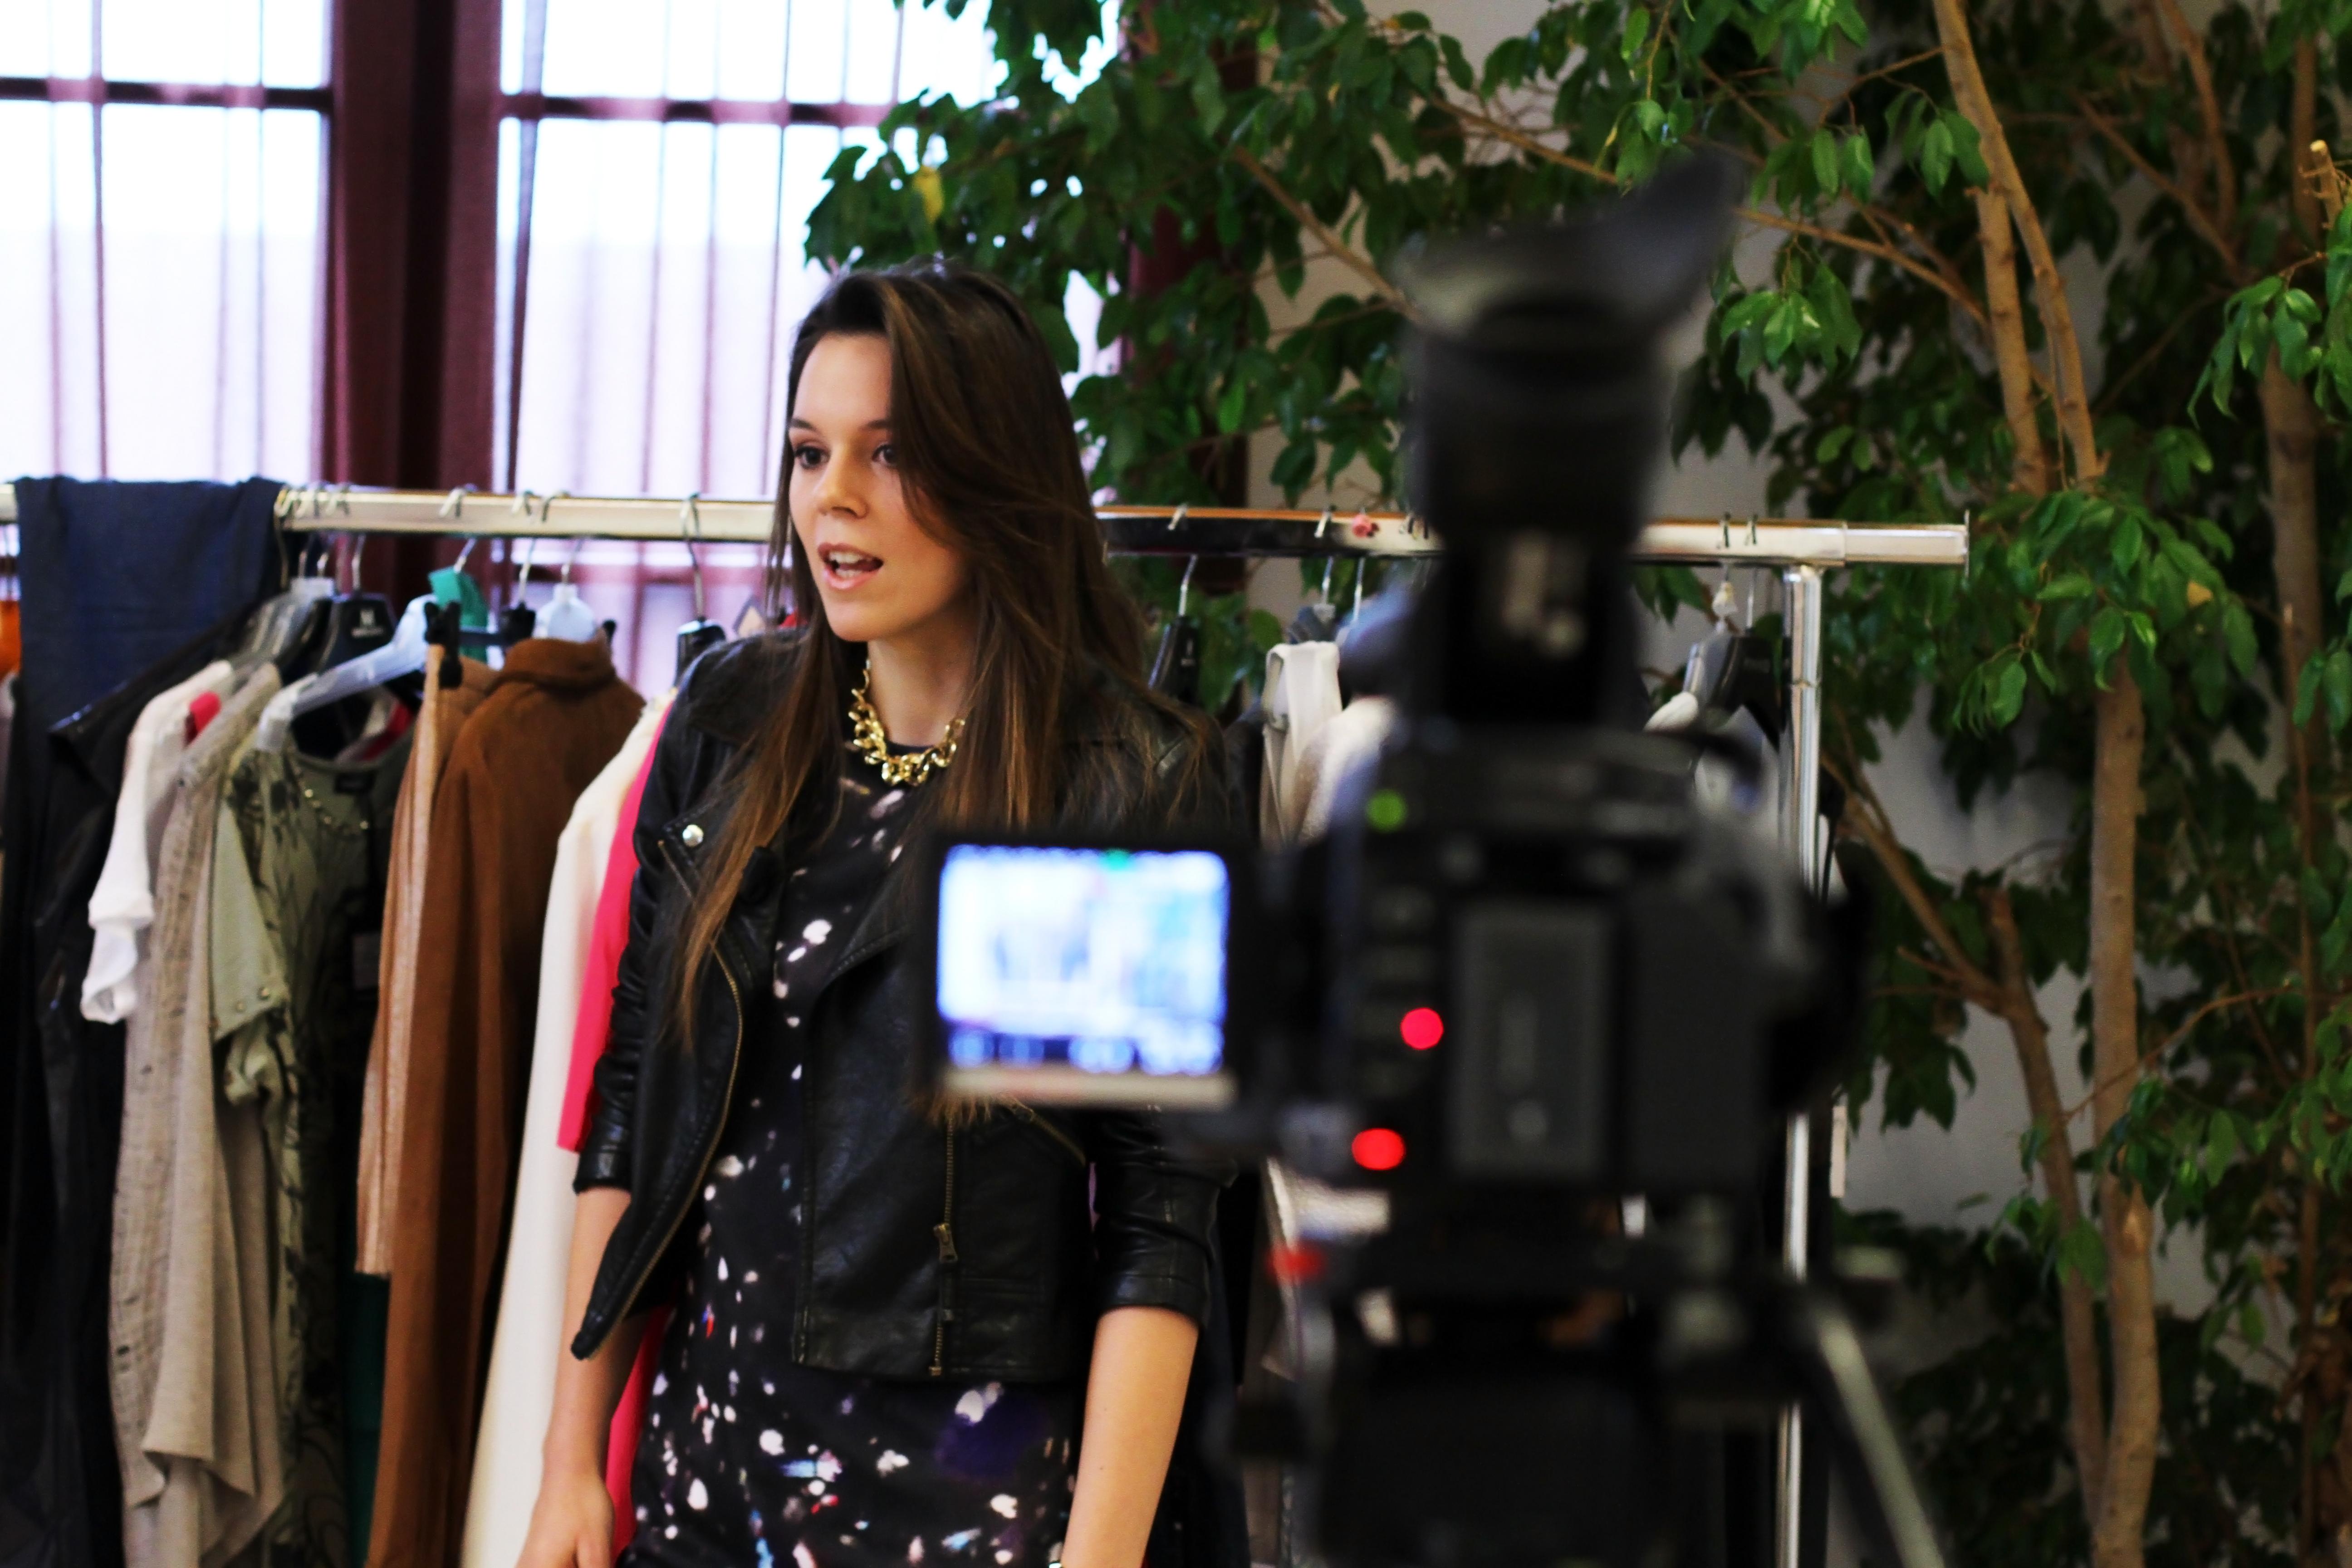 franciacorta outlet village video intervista irene colzi irene closet fashion blogger